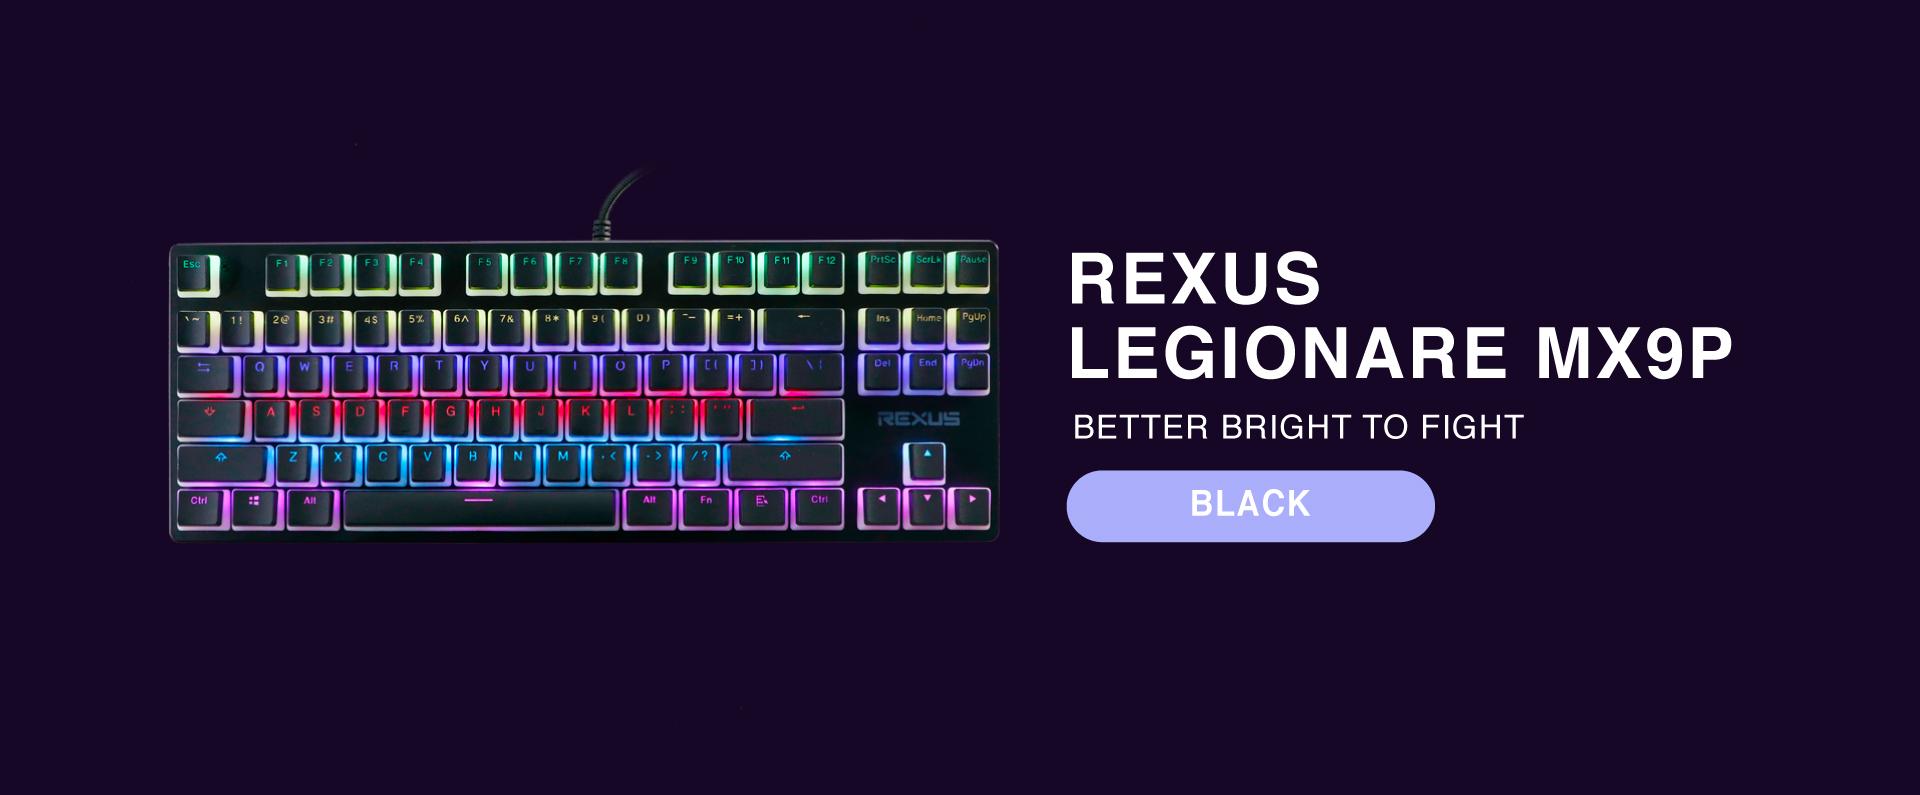 keyboard Rexus Legionare MX9P 3